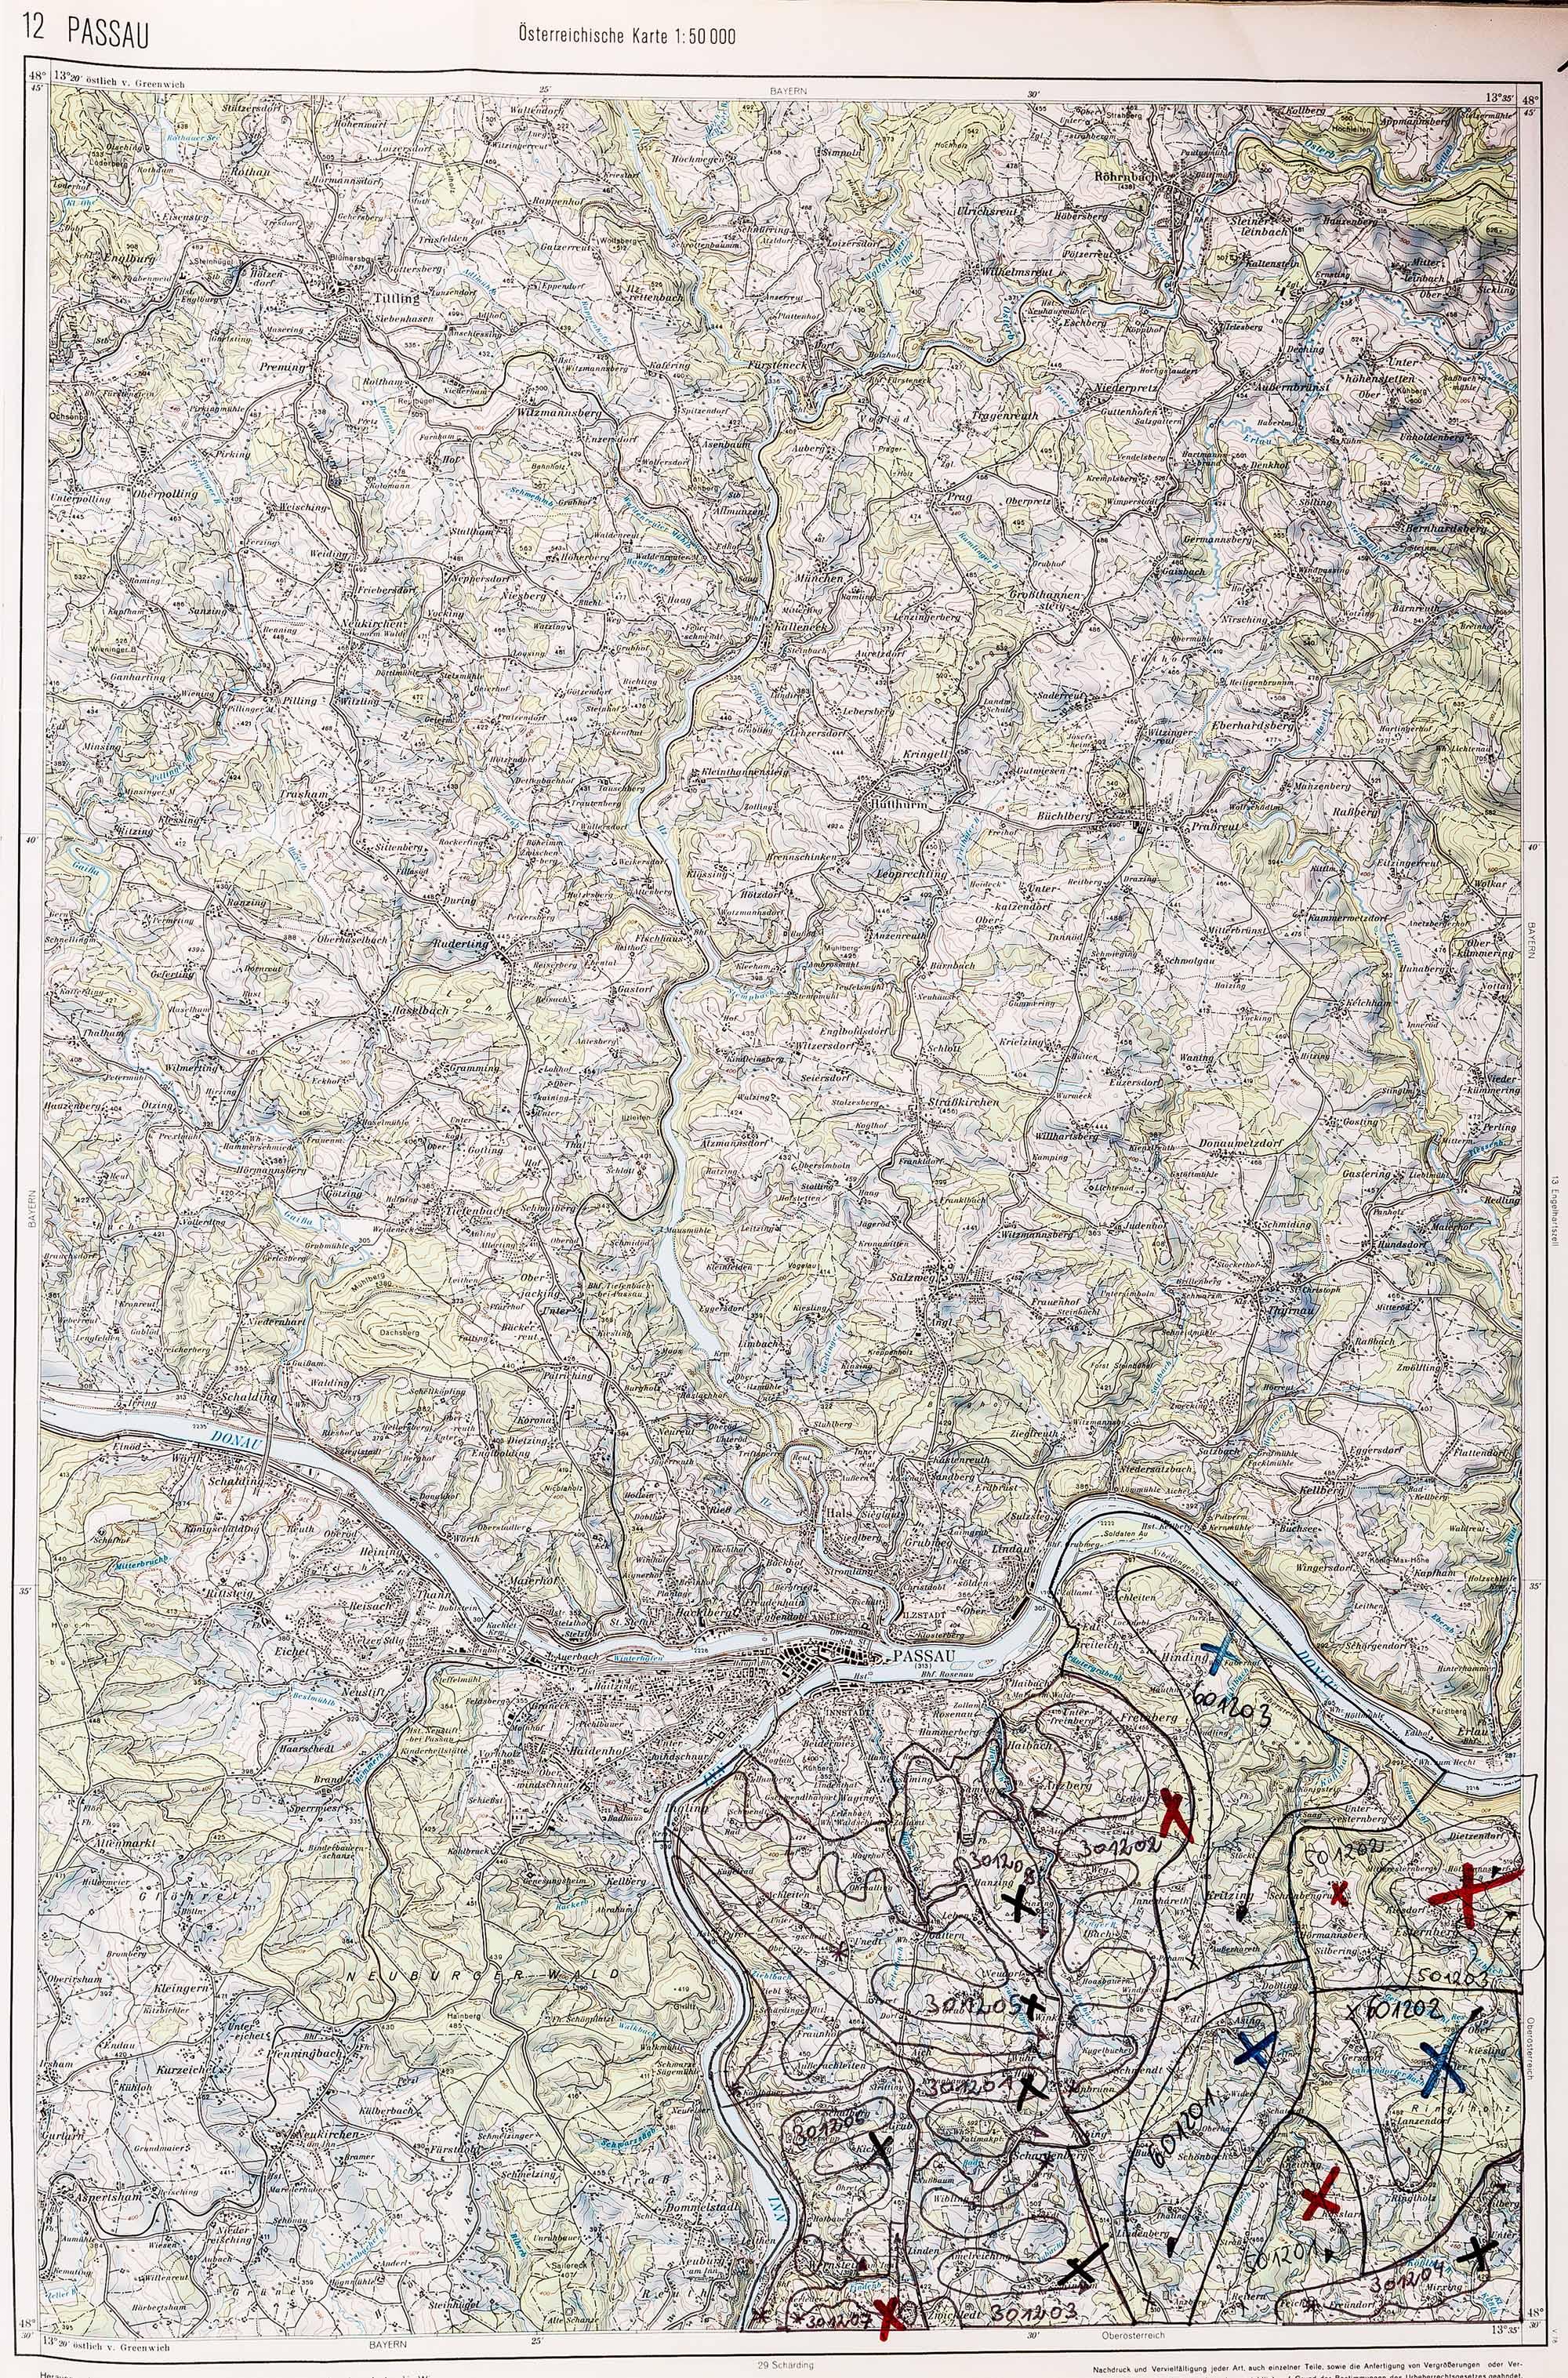 1983-1986 Karte 012